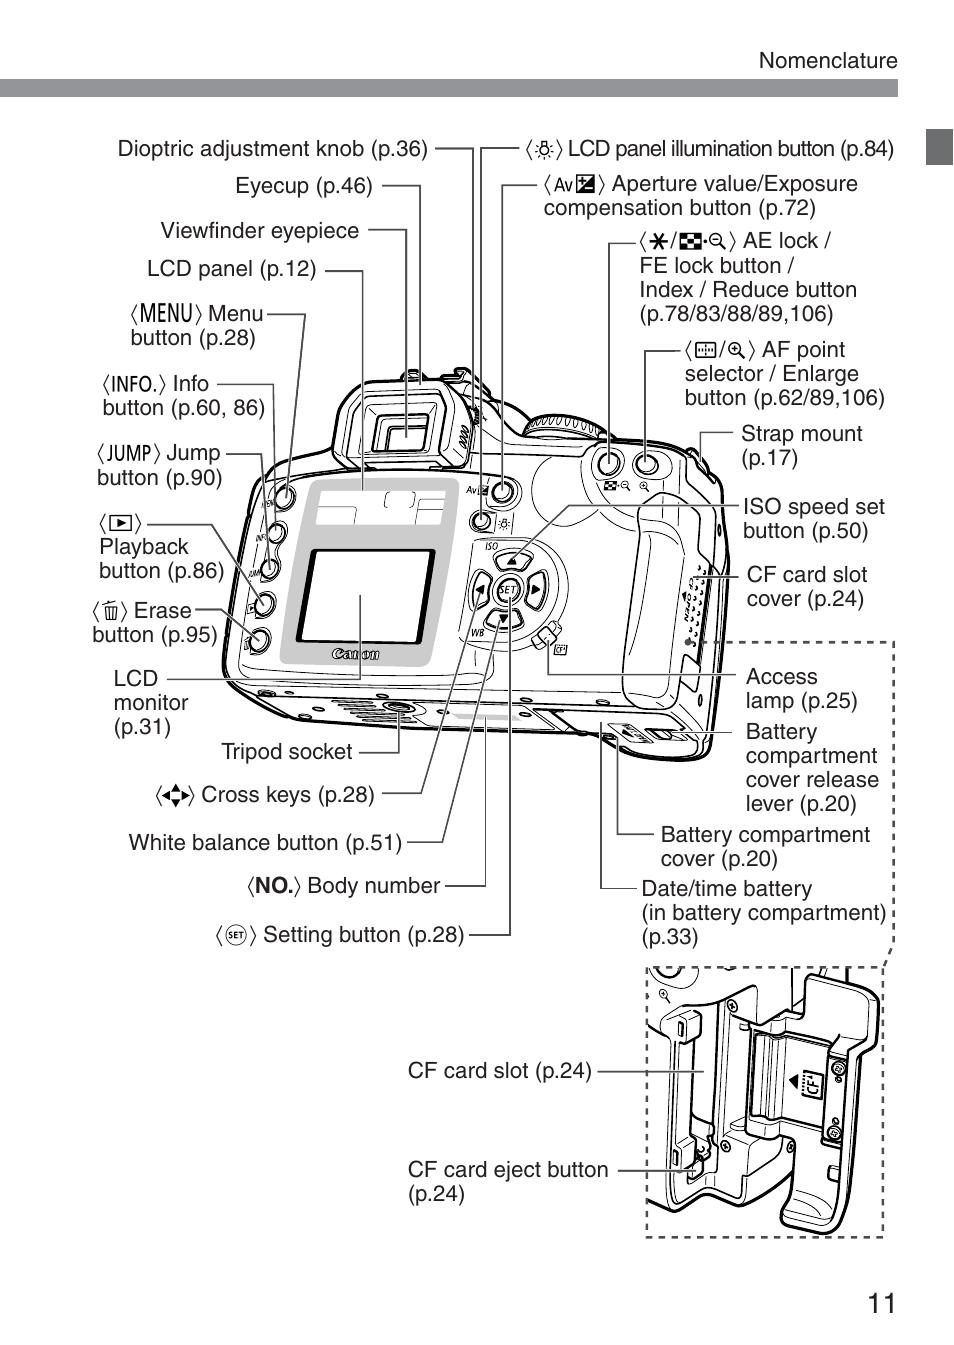 canon ds6041 user manual page 11 140 original mode also for rh manualsdir com canon ds6041 manual user's guide canon ds6041 manual user's guide